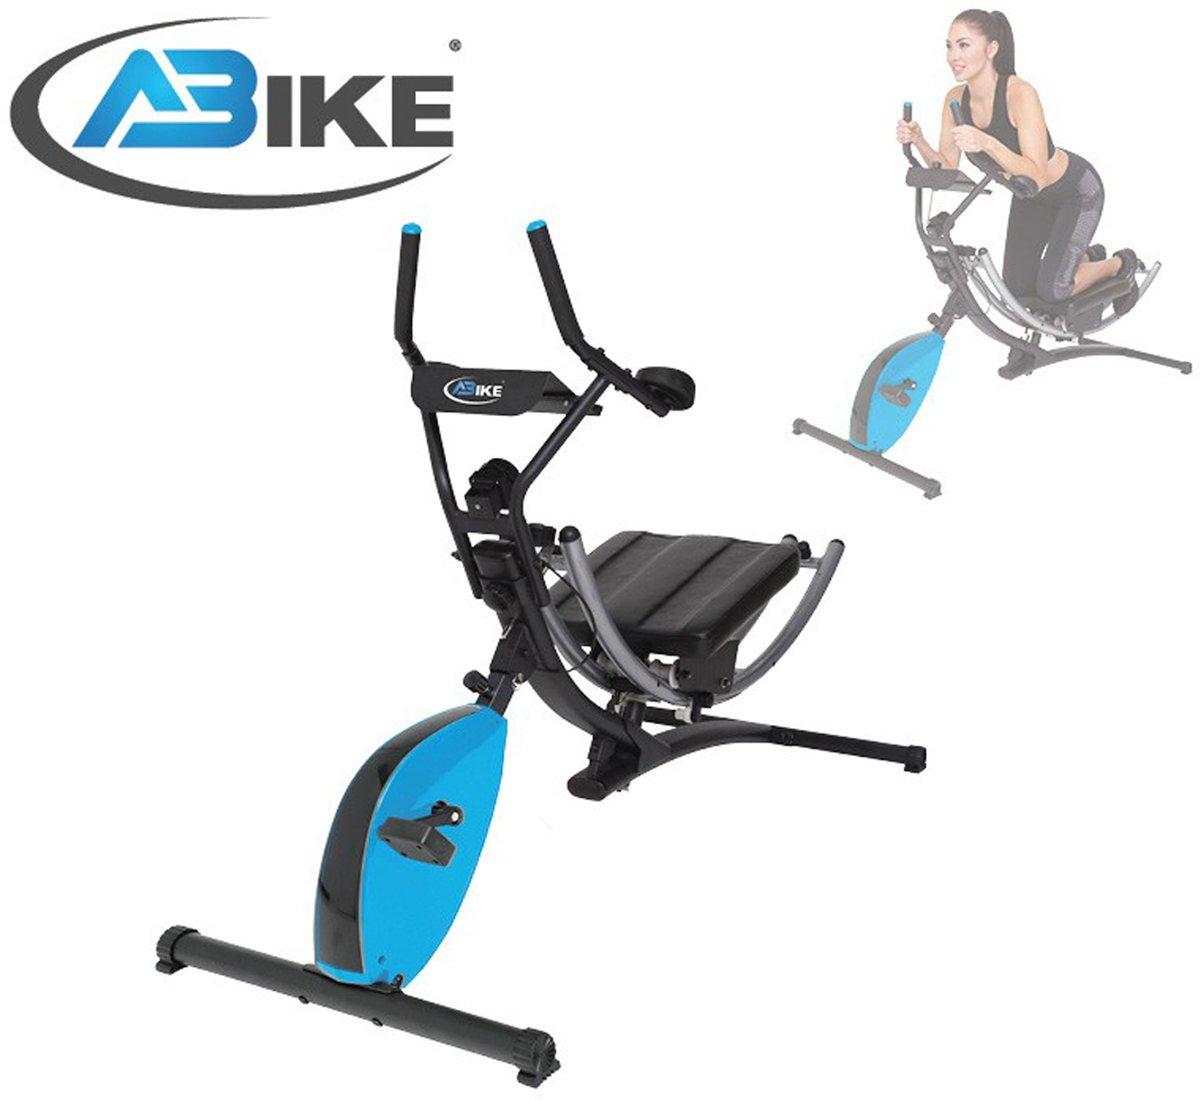 AB Bike Buikspiertrainer Workout kopen